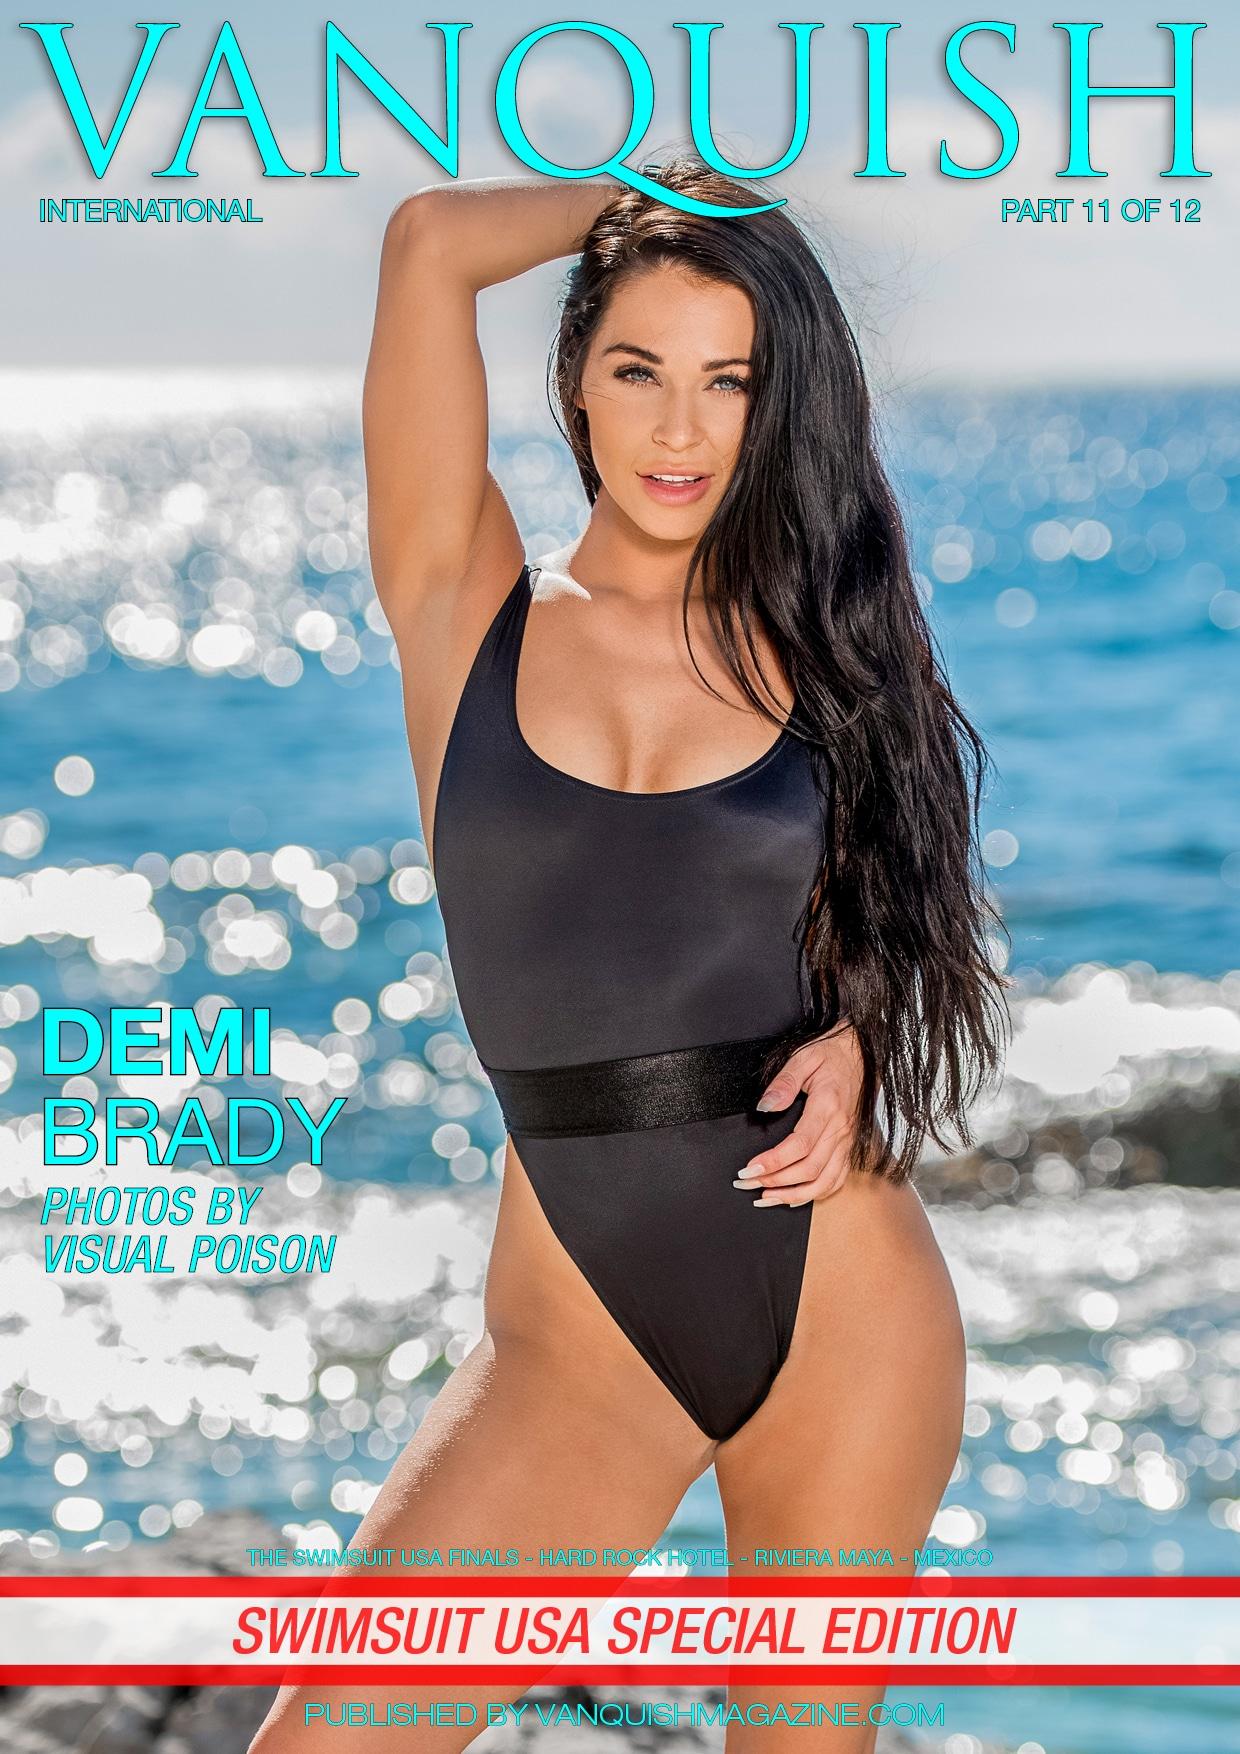 Vanquish Magazine - Swimsuit USA 2018 - Part 11 - Demi Brady